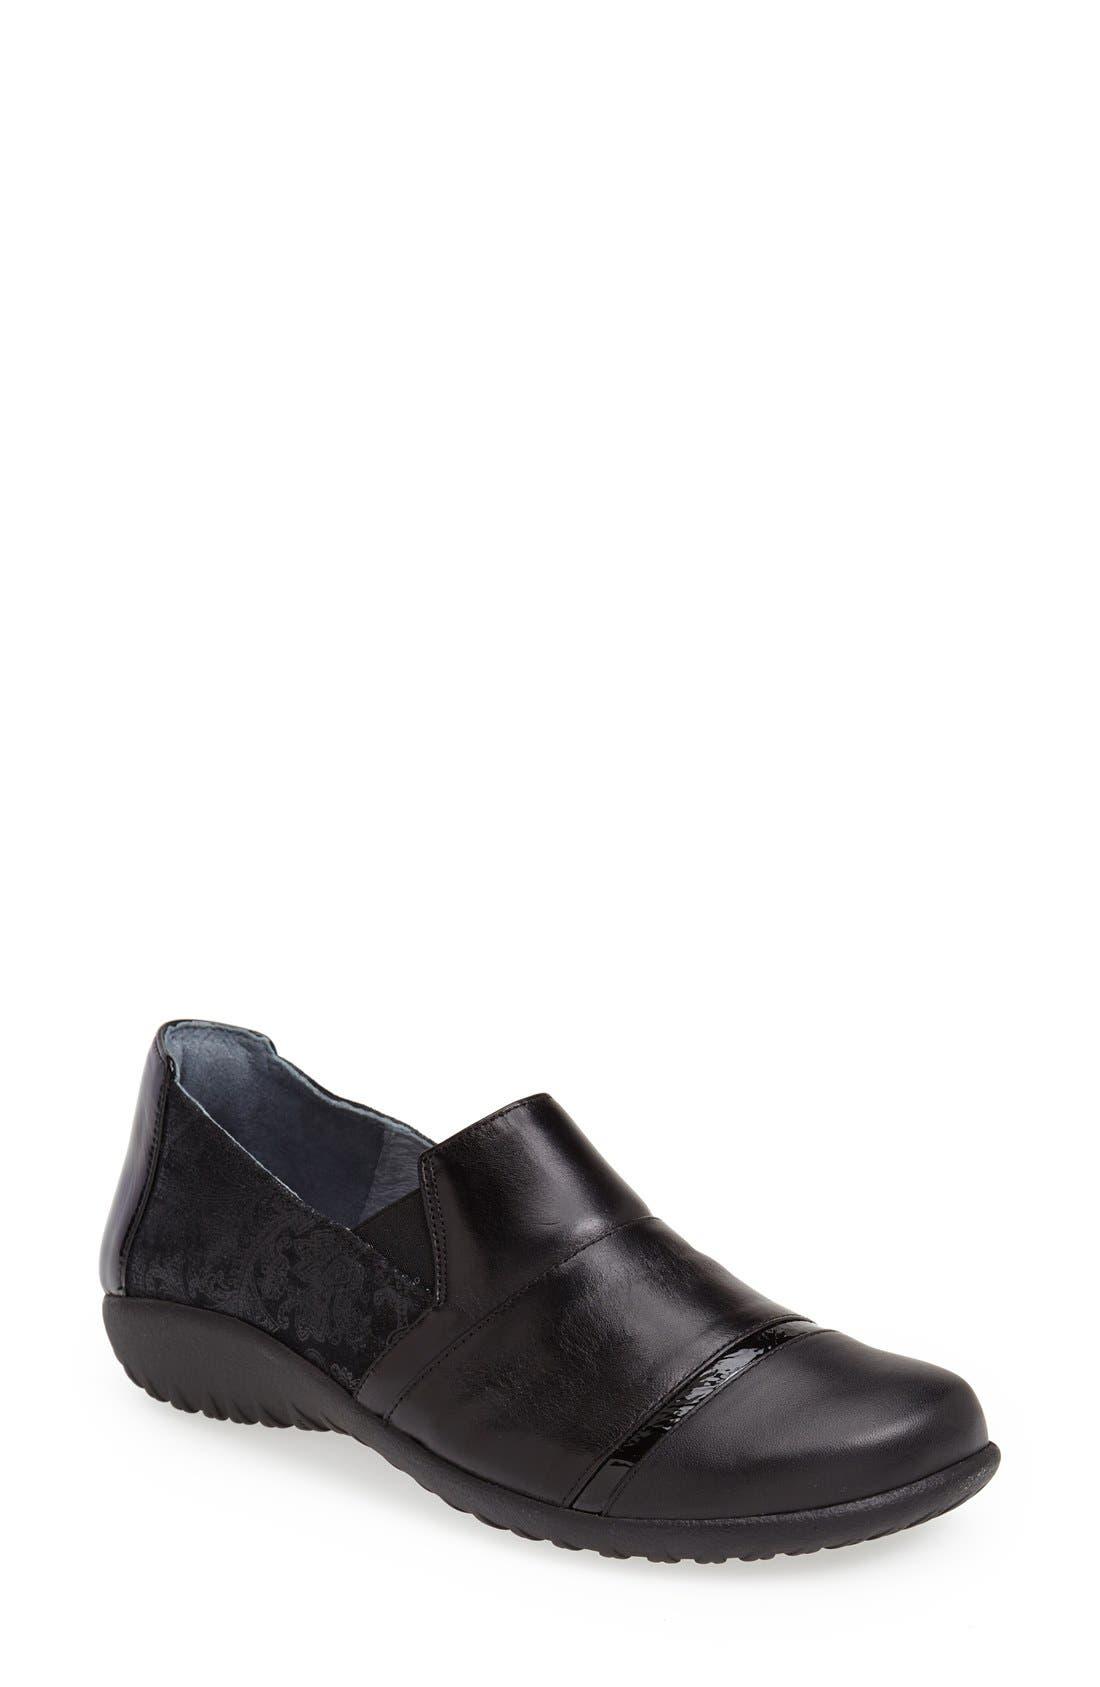 'Miro' Loafer,                             Main thumbnail 1, color,                             Black Lace